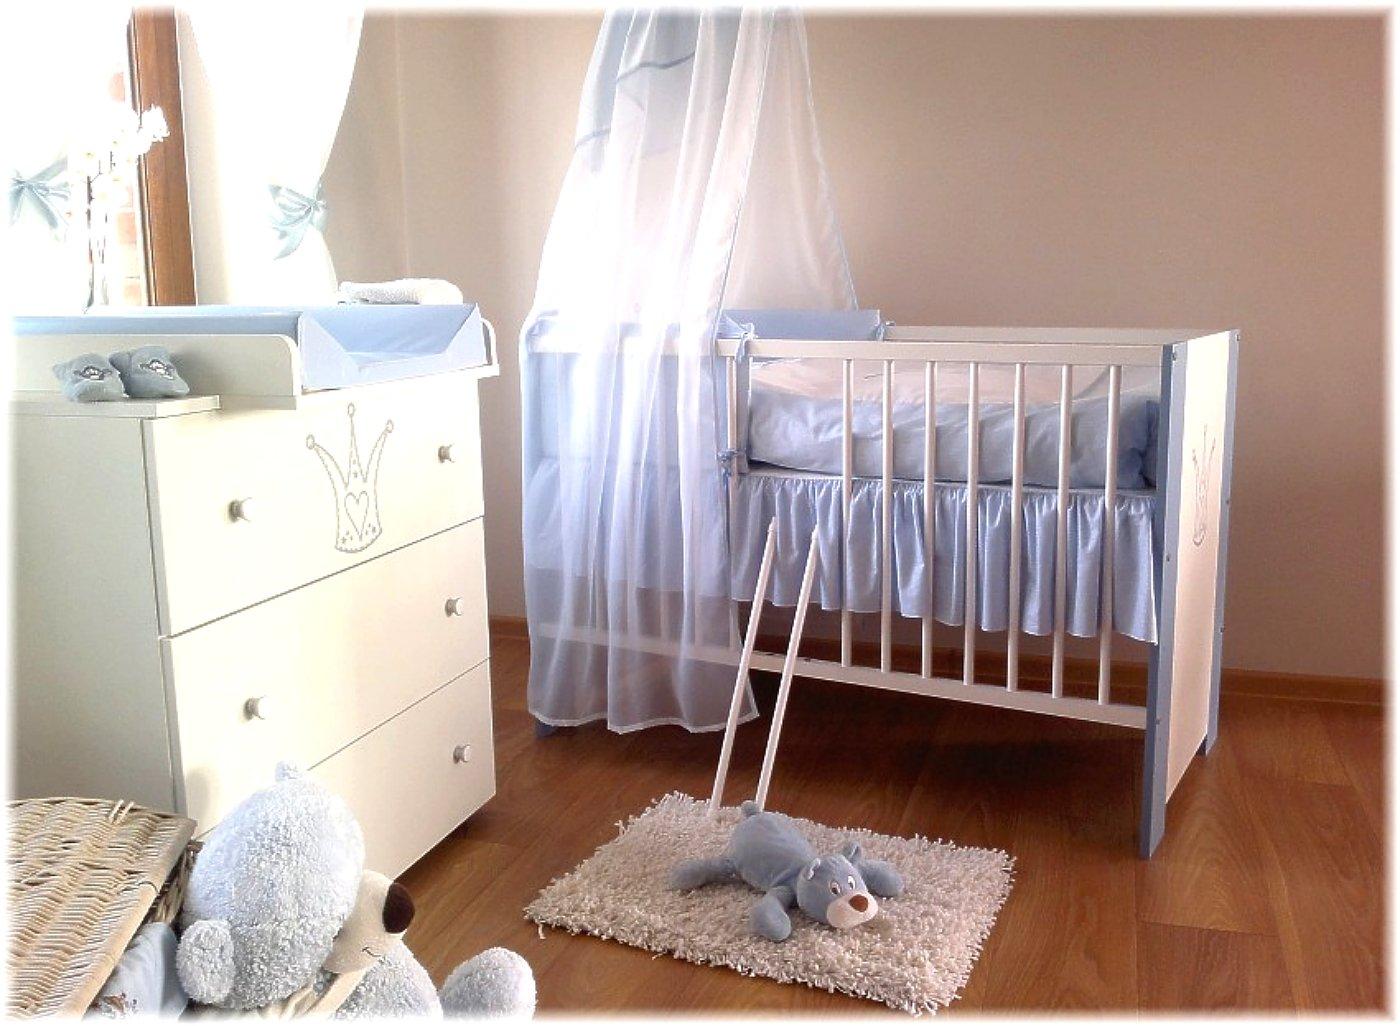 Wickelkommode Lattenrost KinderbettBaby-Krone blau incl Bettw/äsche Komplettset 12 Teile Matratze